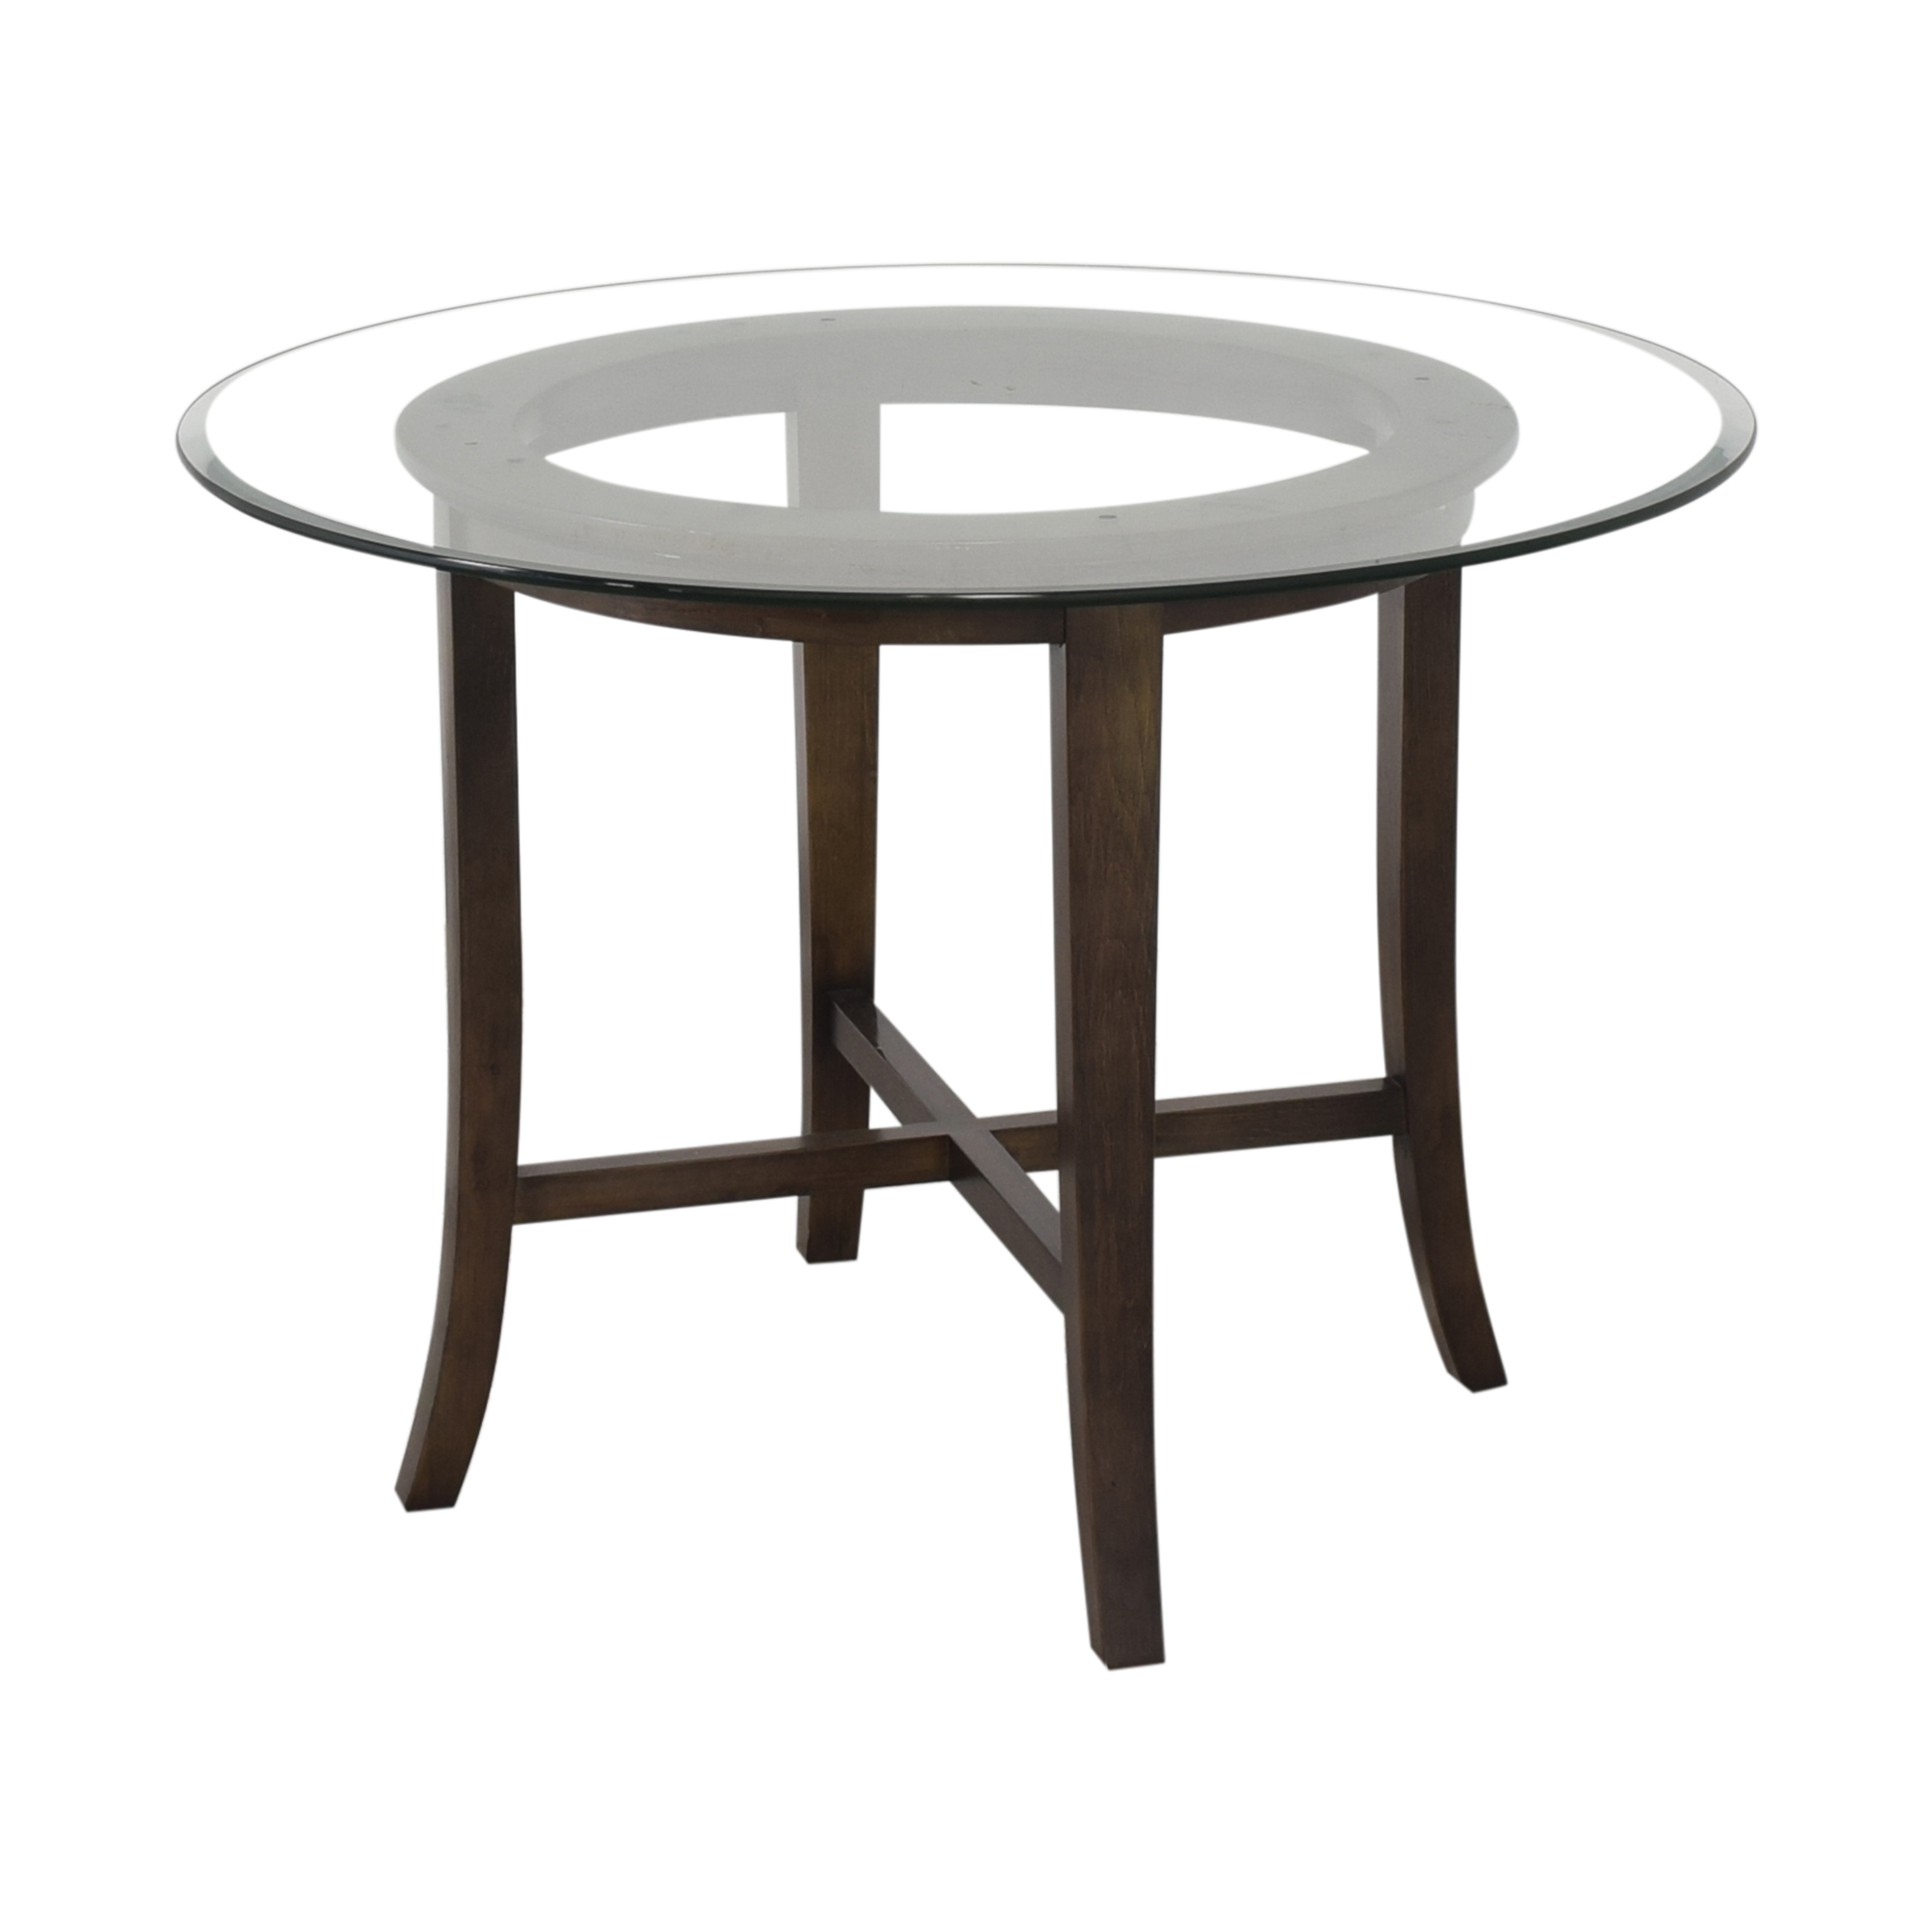 shop Crate & Barrel Halo Dining Table Crate & Barrel Tables